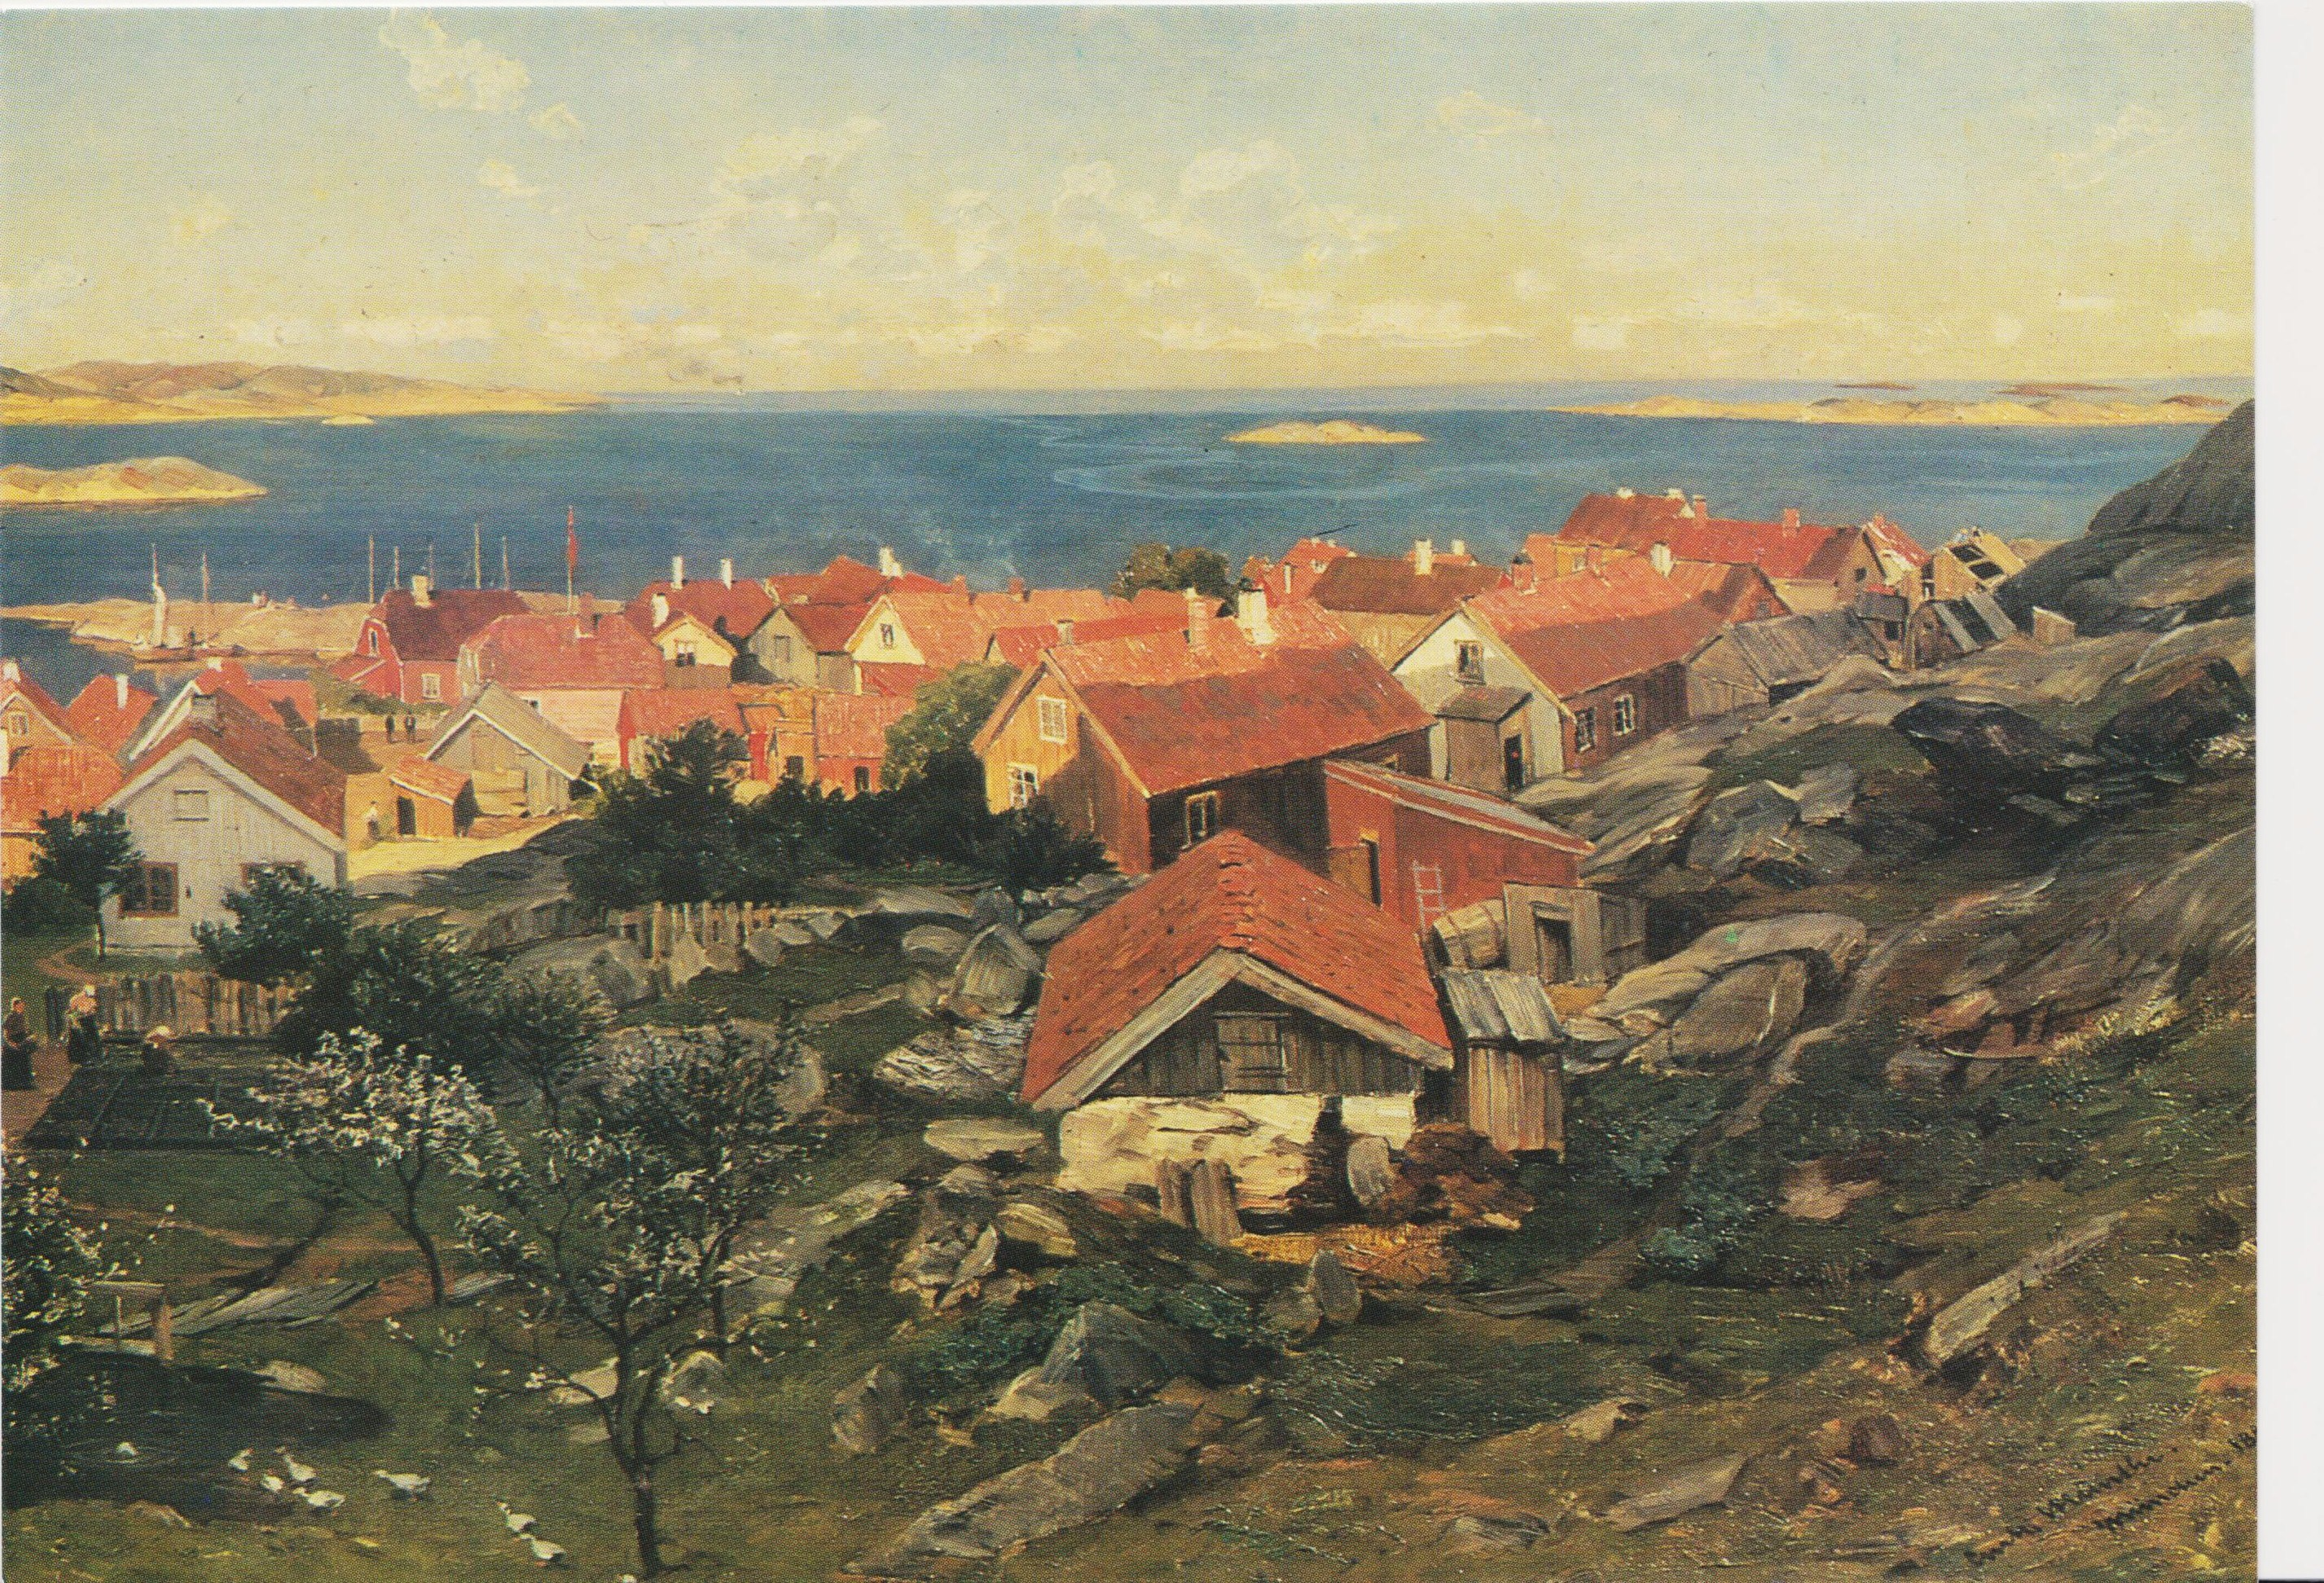 Nevlunghavn, Gerhardt Munthe